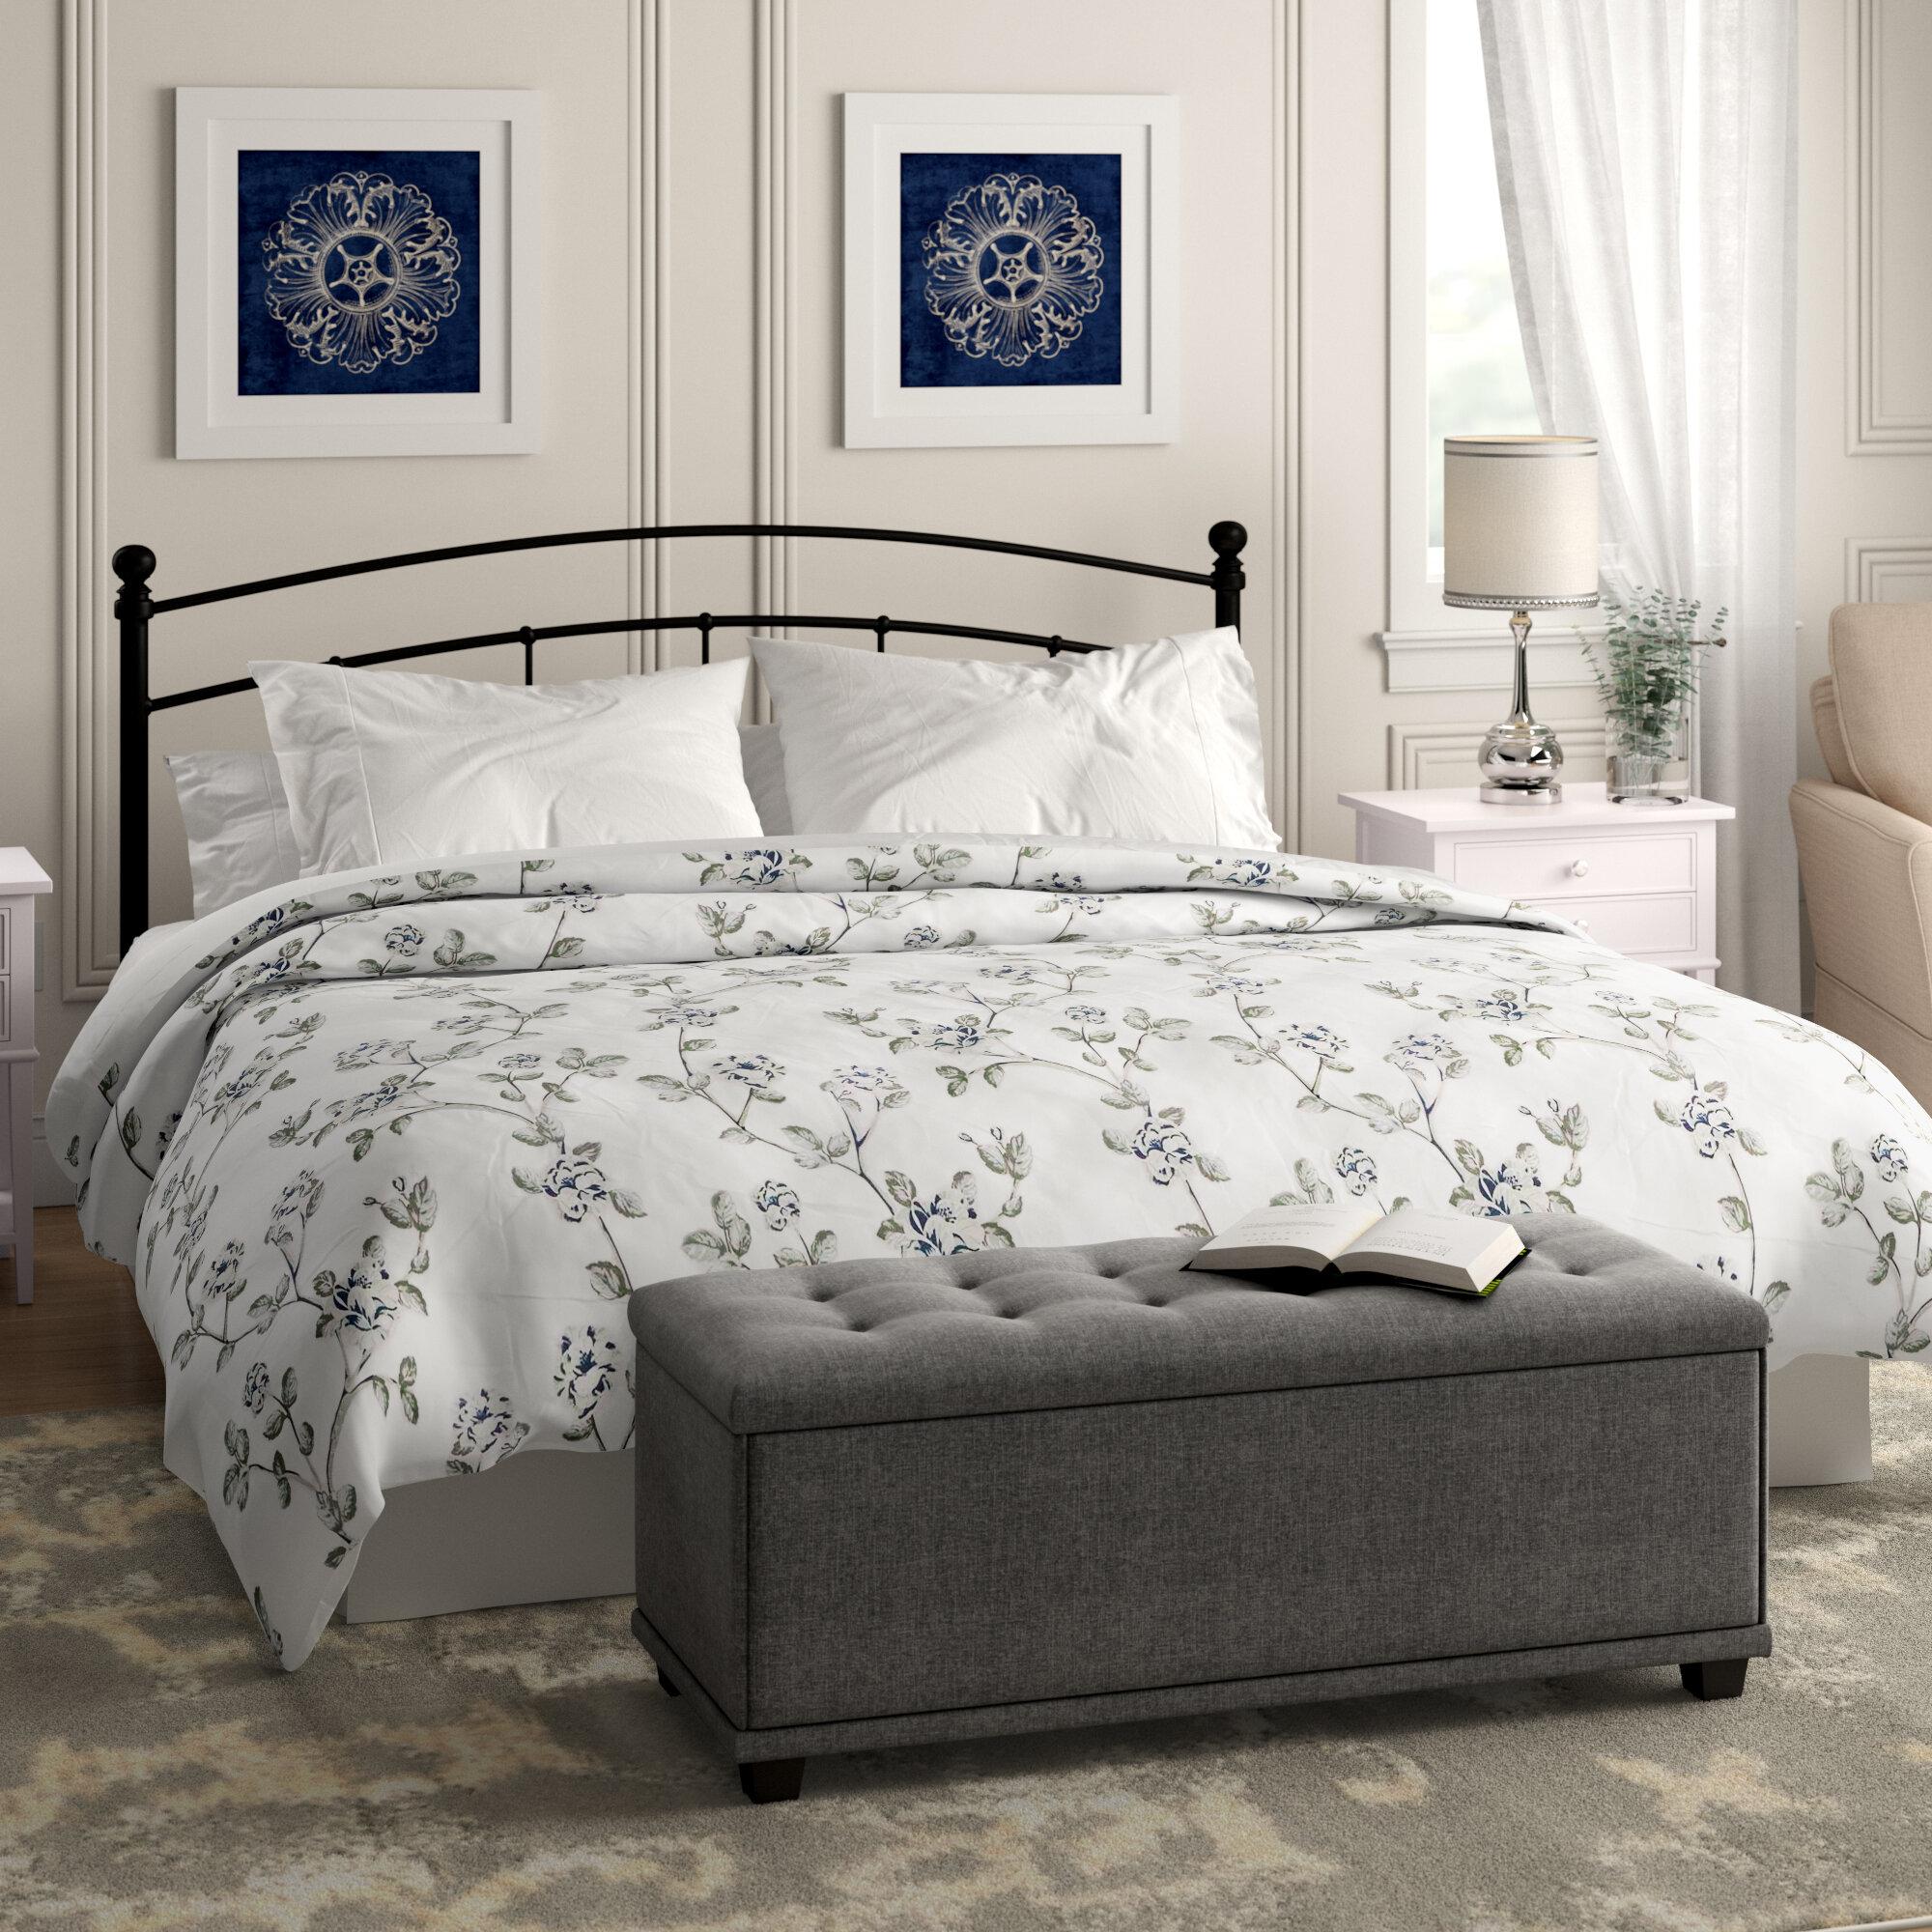 Kitchen Cabinet Warehouse Manassas Va: Winston Porter Manassas Floral Printed Quilted Blanket